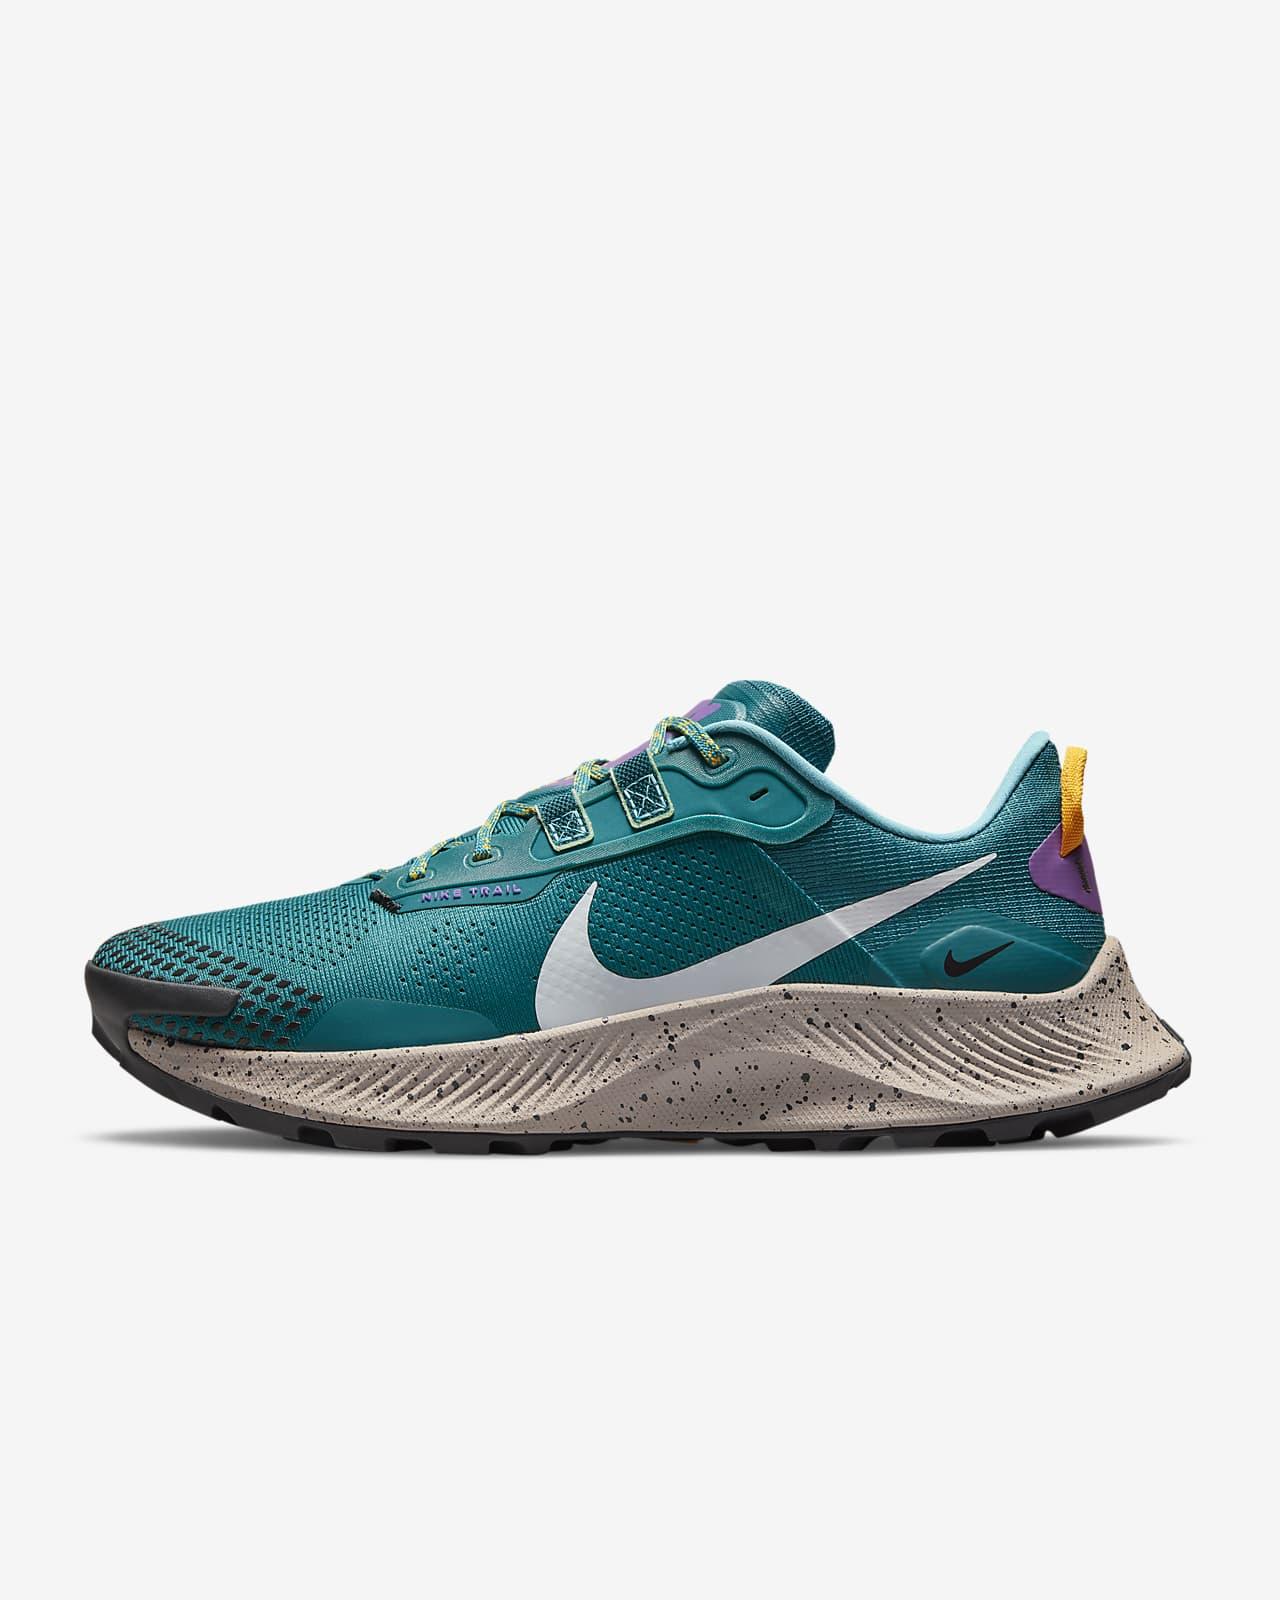 Мужские кроссовки для трейлраннинга Nike Pegasus Trail 3